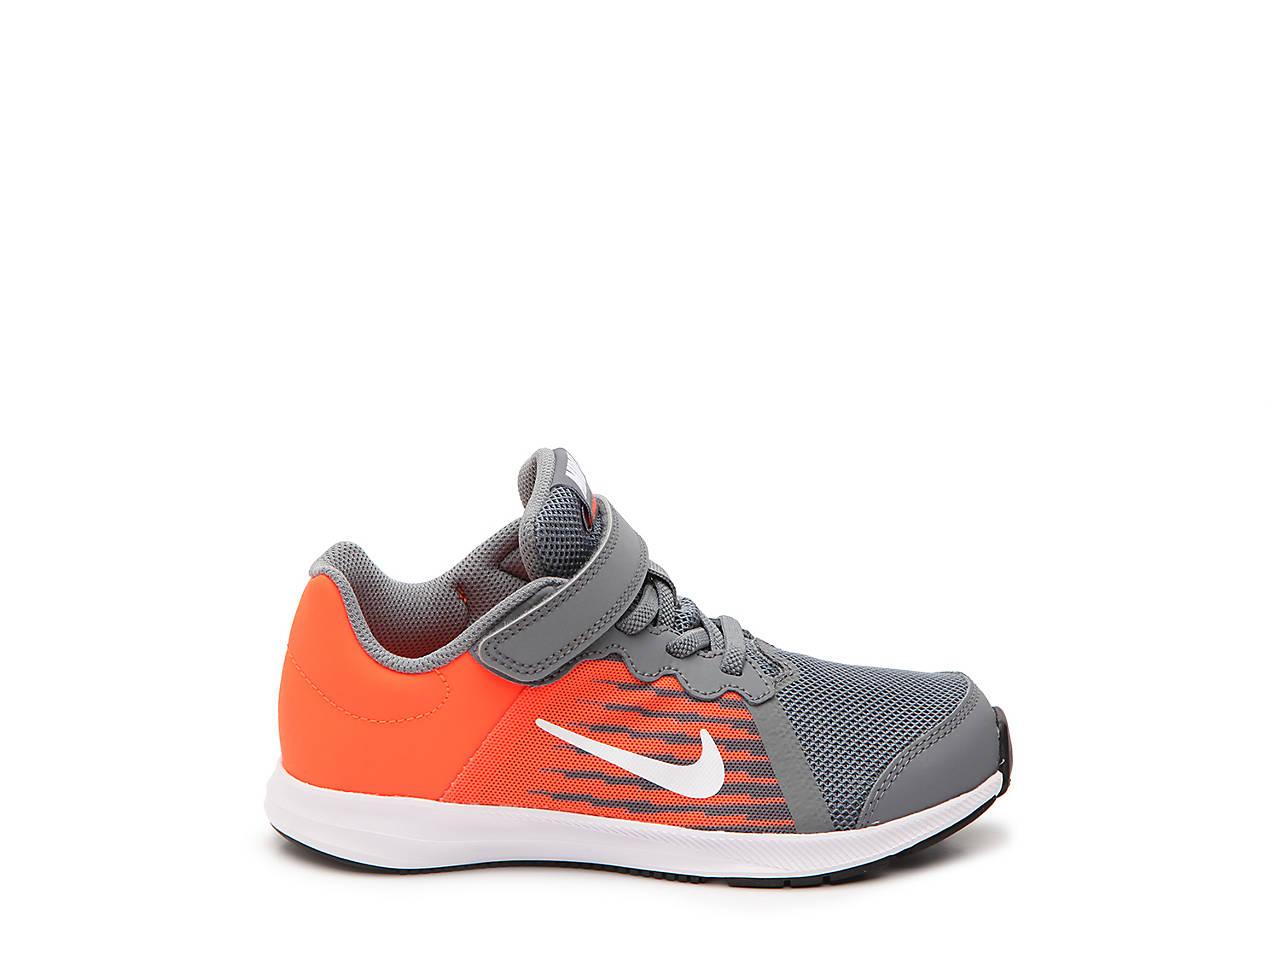 f90b976be42 Nike Downshifter 8 Toddler   Youth Running Shoe Kids Shoes